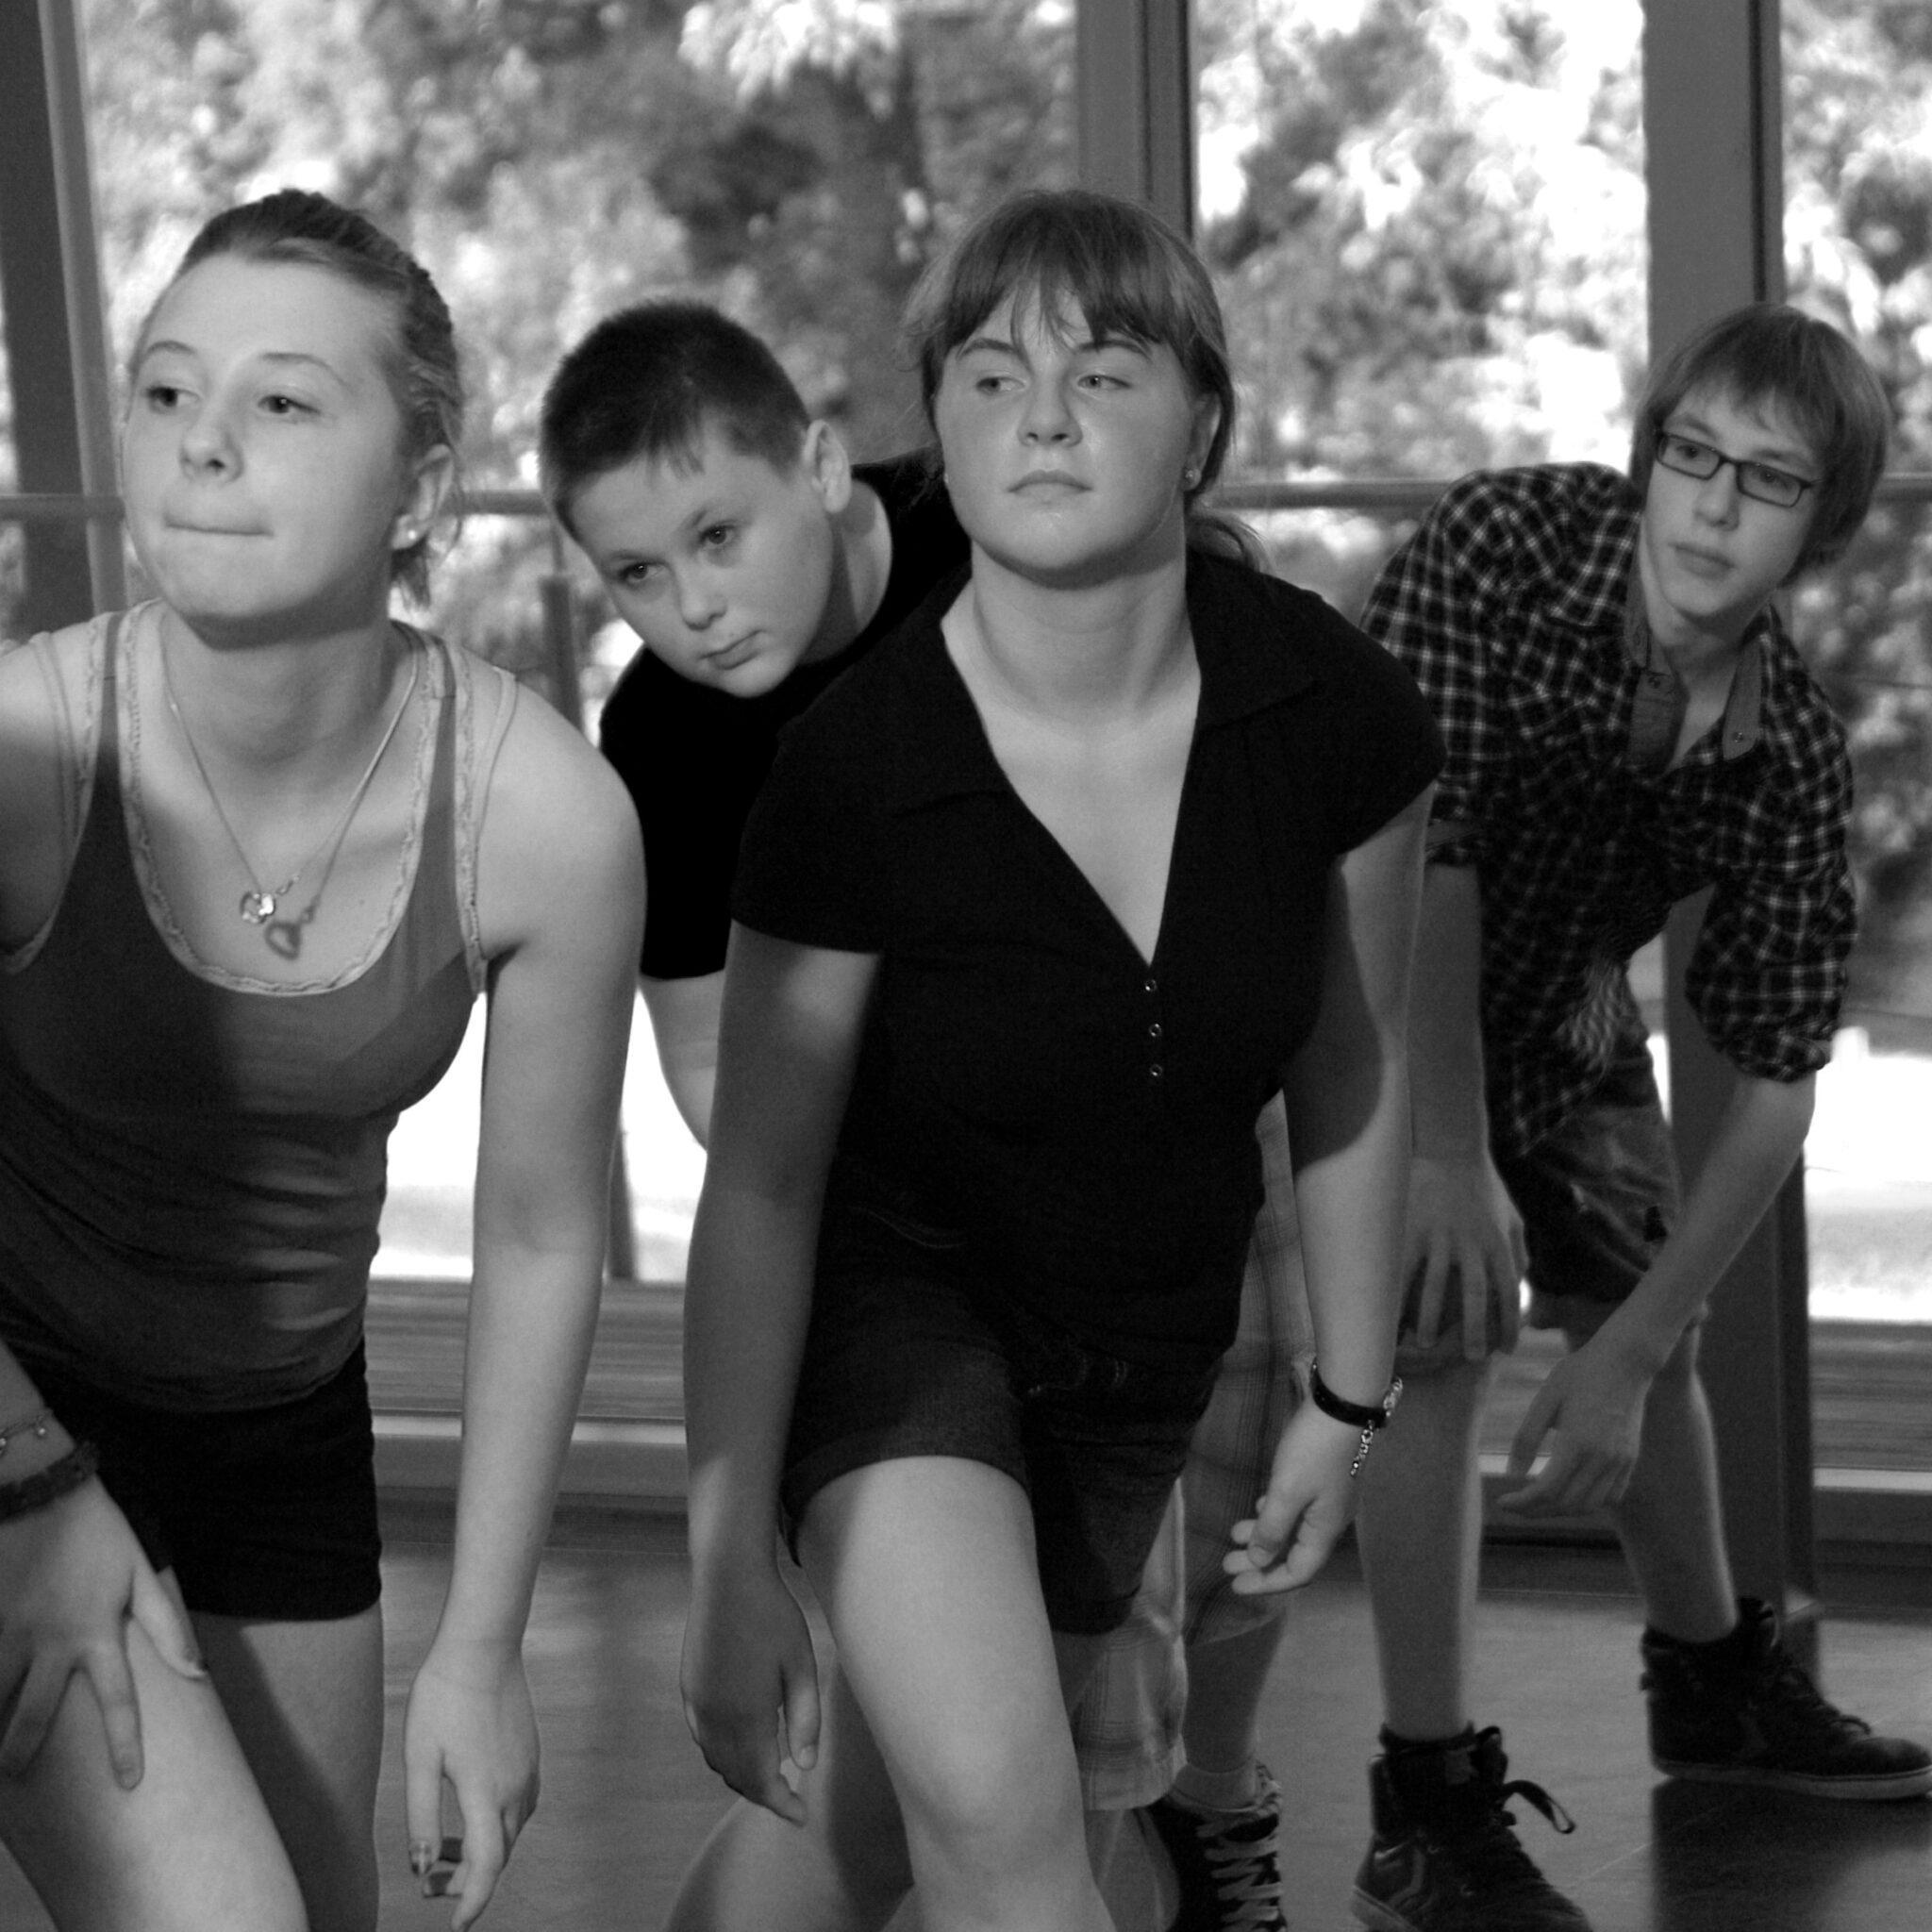 Jahr 2012. Kindertanzclub bravO